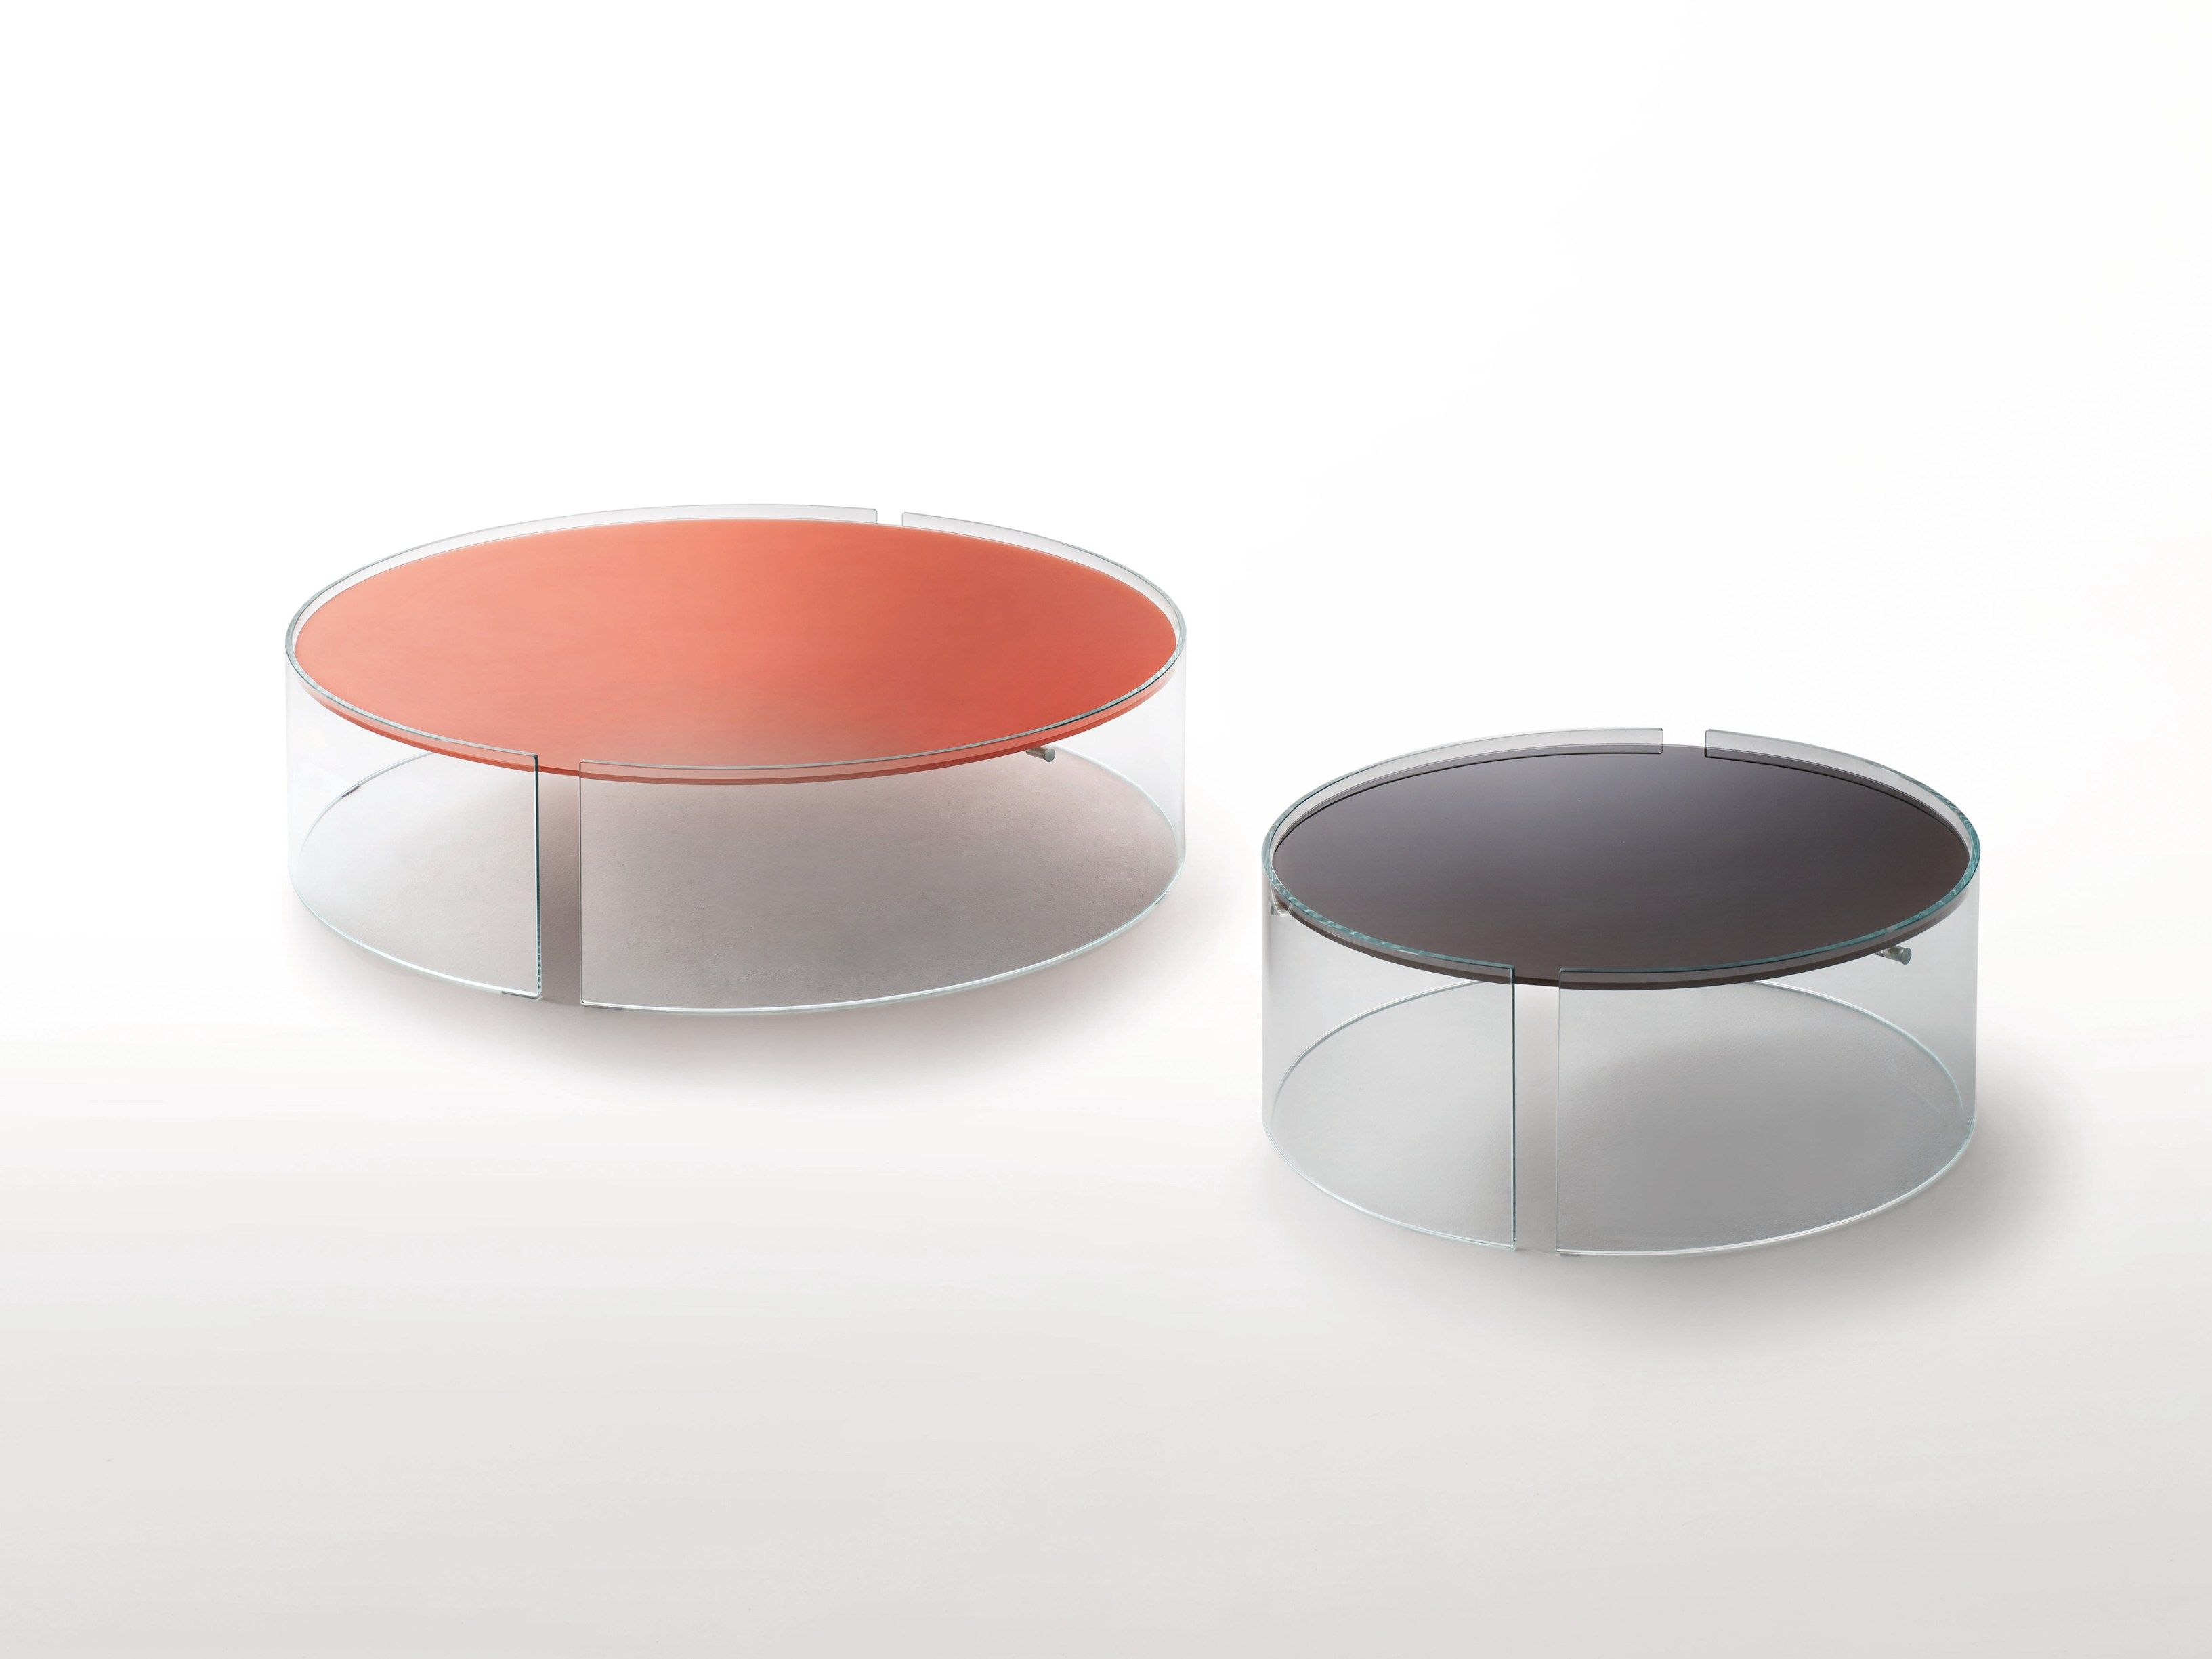 Glas Italia Glass Furnishings And Accessories Archiproducts Italia Design Glas Table Furniture [ jpg ]